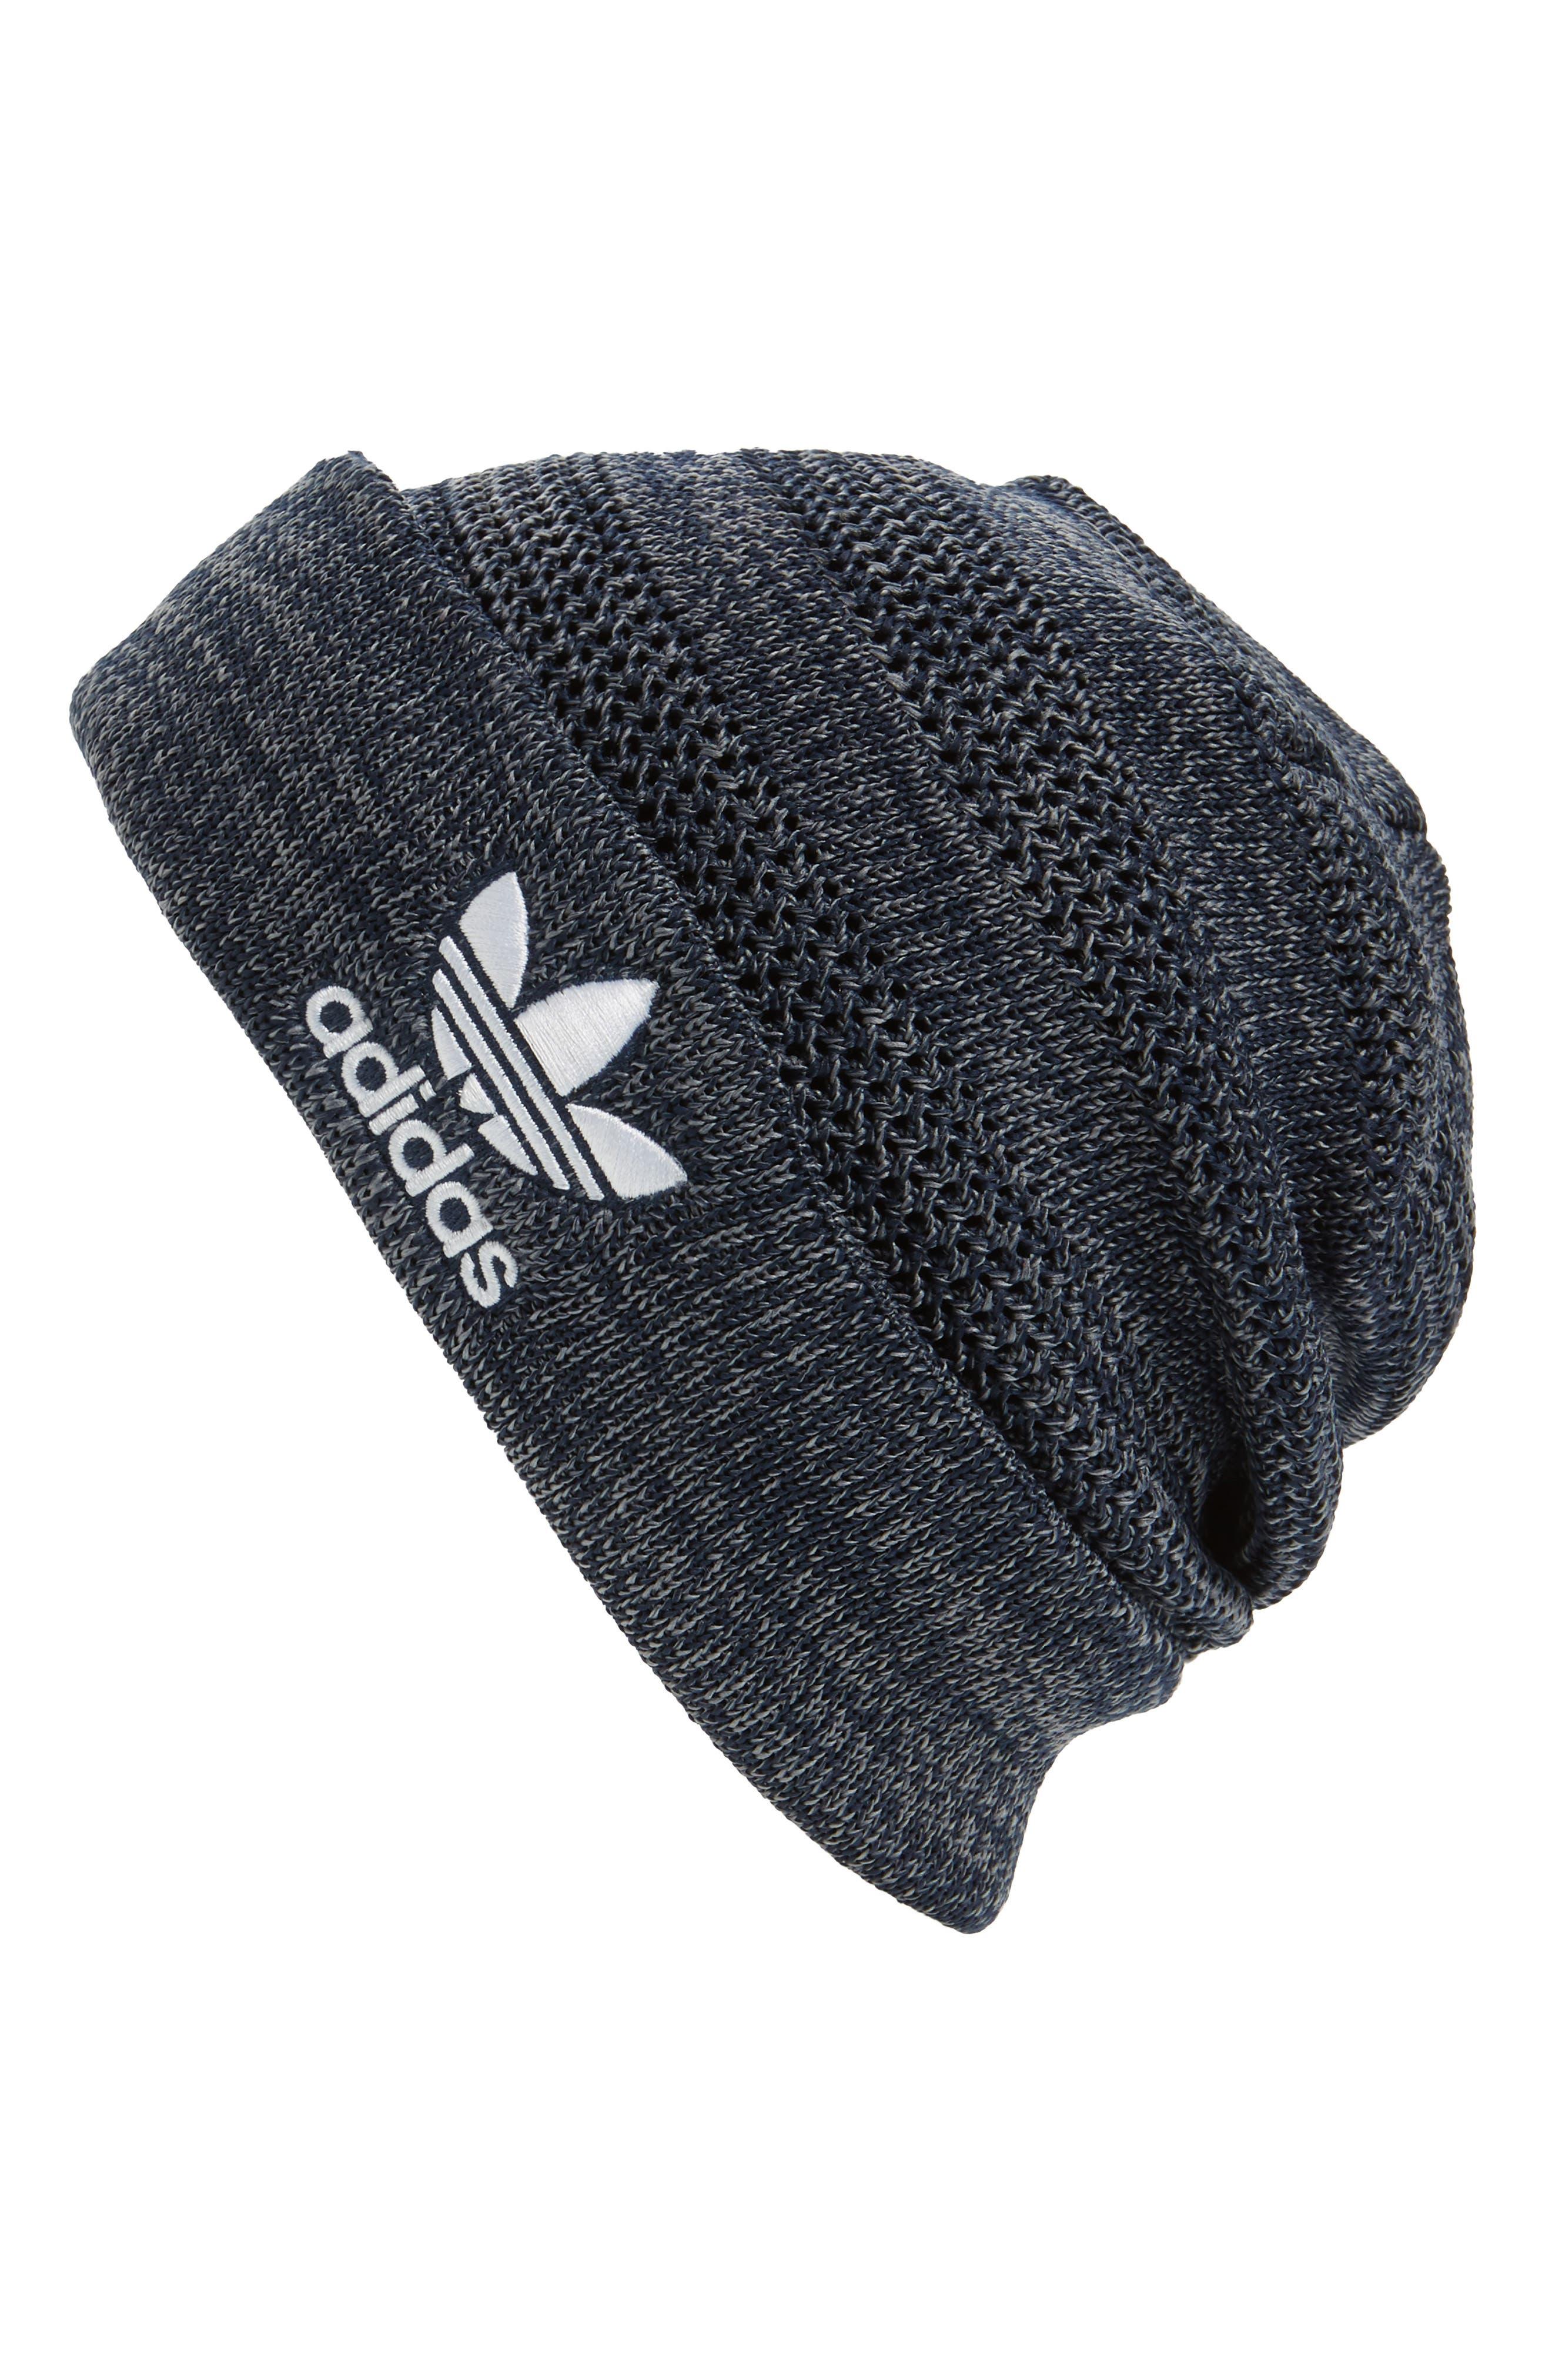 Alternate Image 1 Selected - adidas Originals Knit Beanie